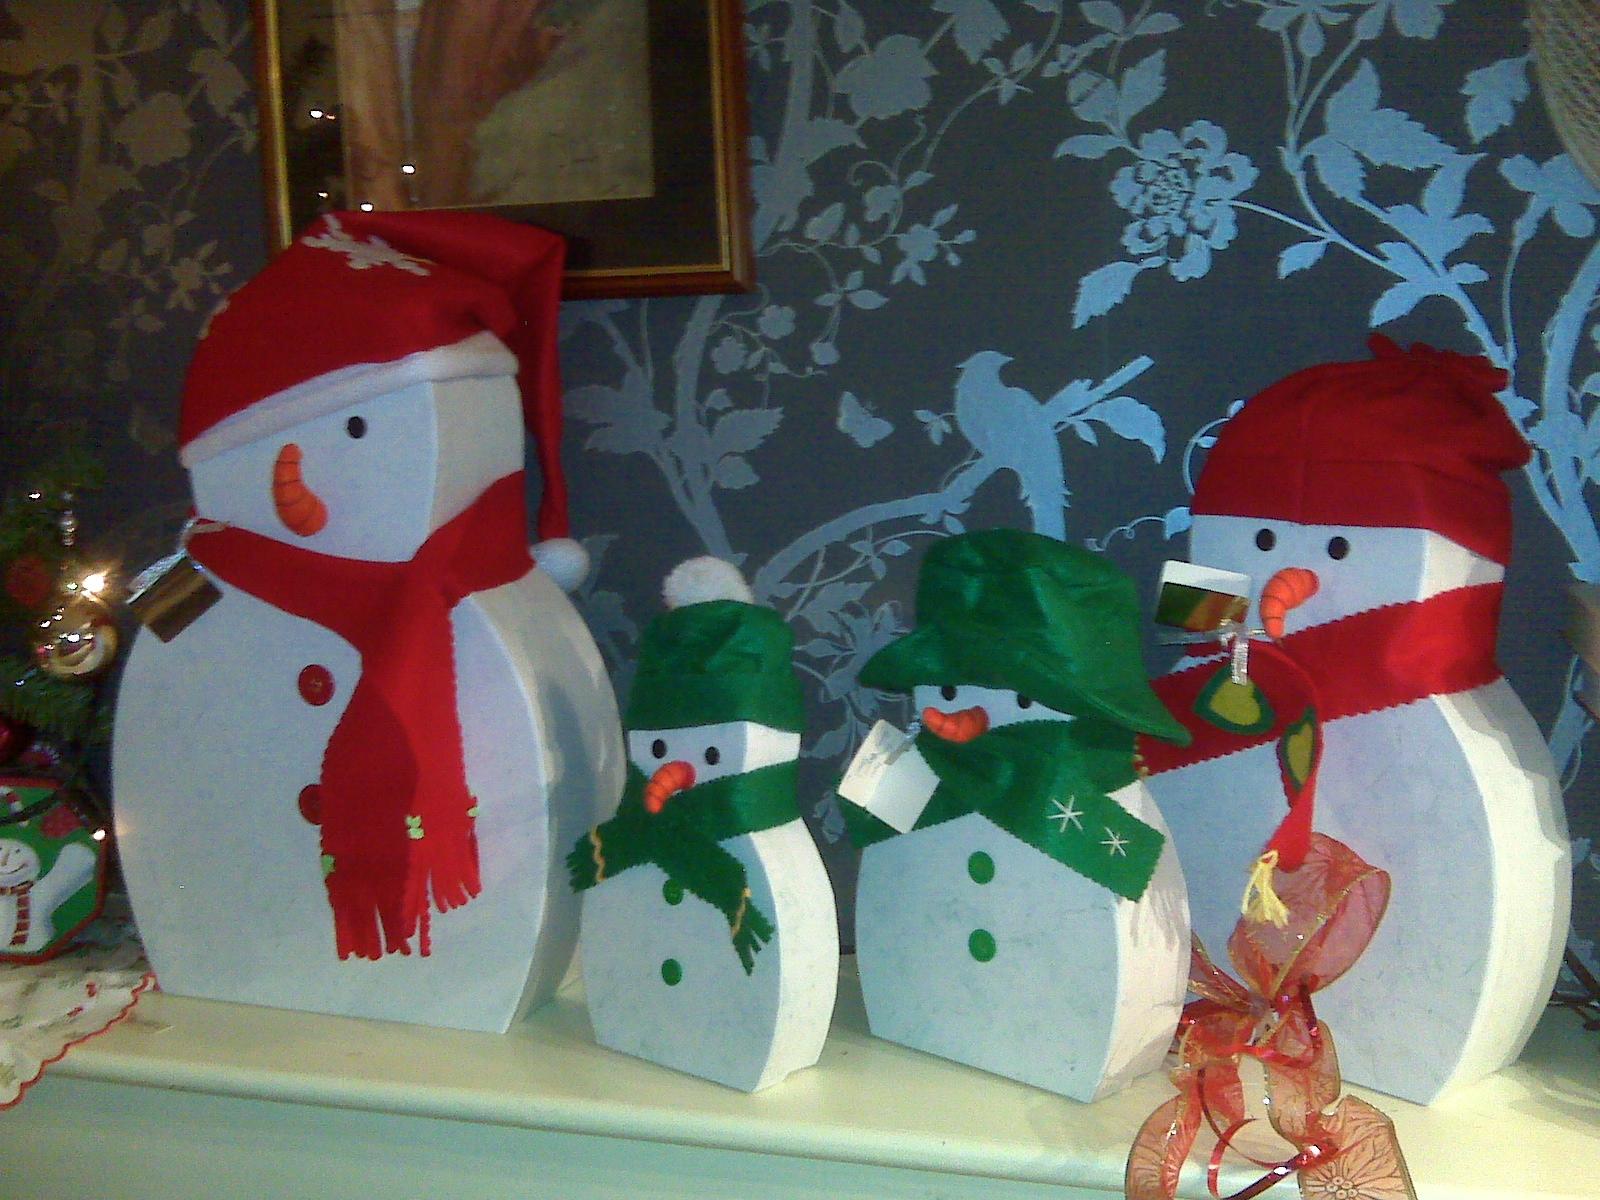 Christmas Snowmen Decorations.Photos Of Your Christmas Decorations The Wonder Of Christmas